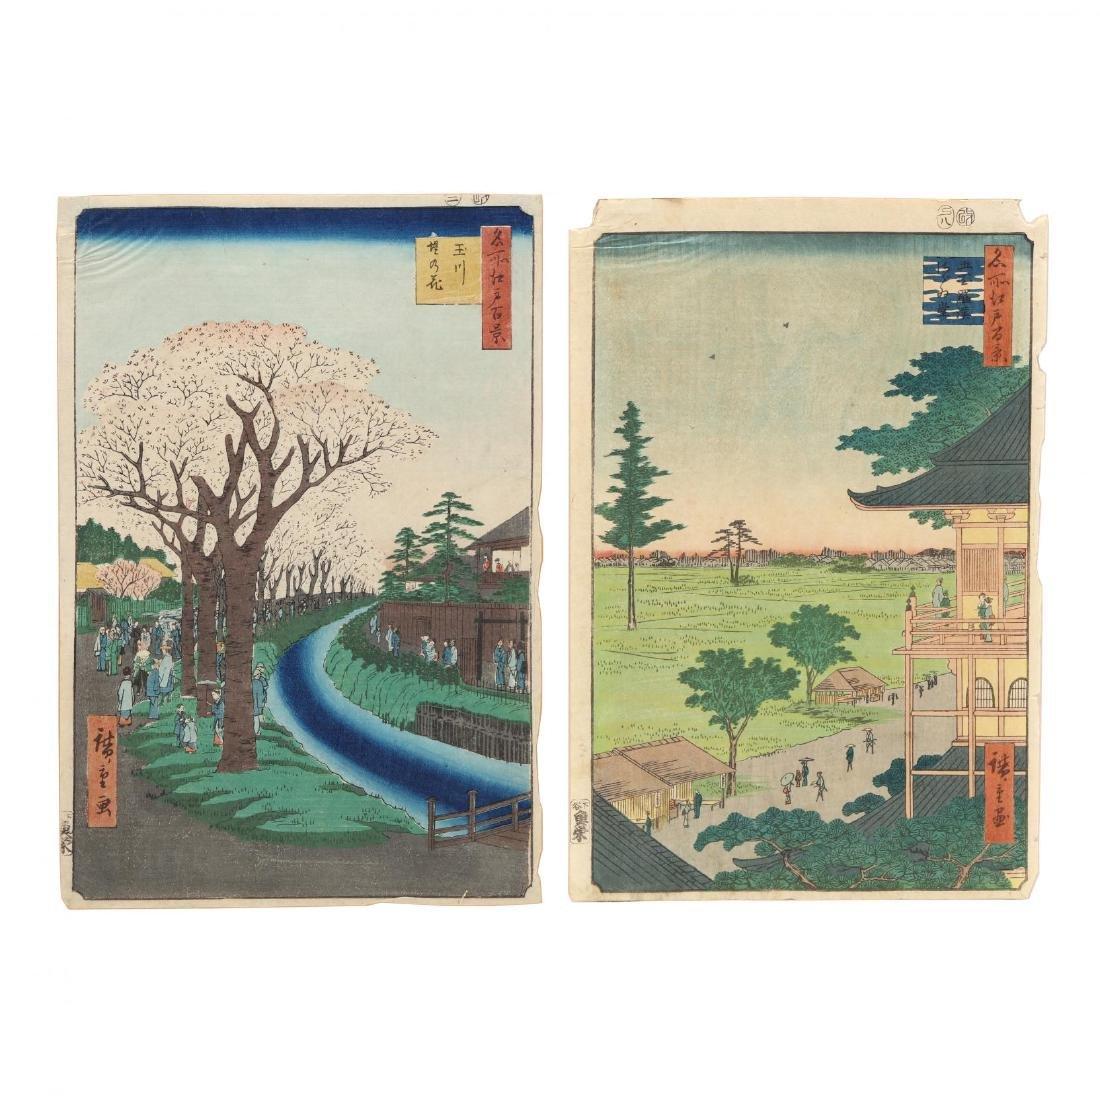 Two Woodblock Prints by Ando Hiroshige (Japanese,